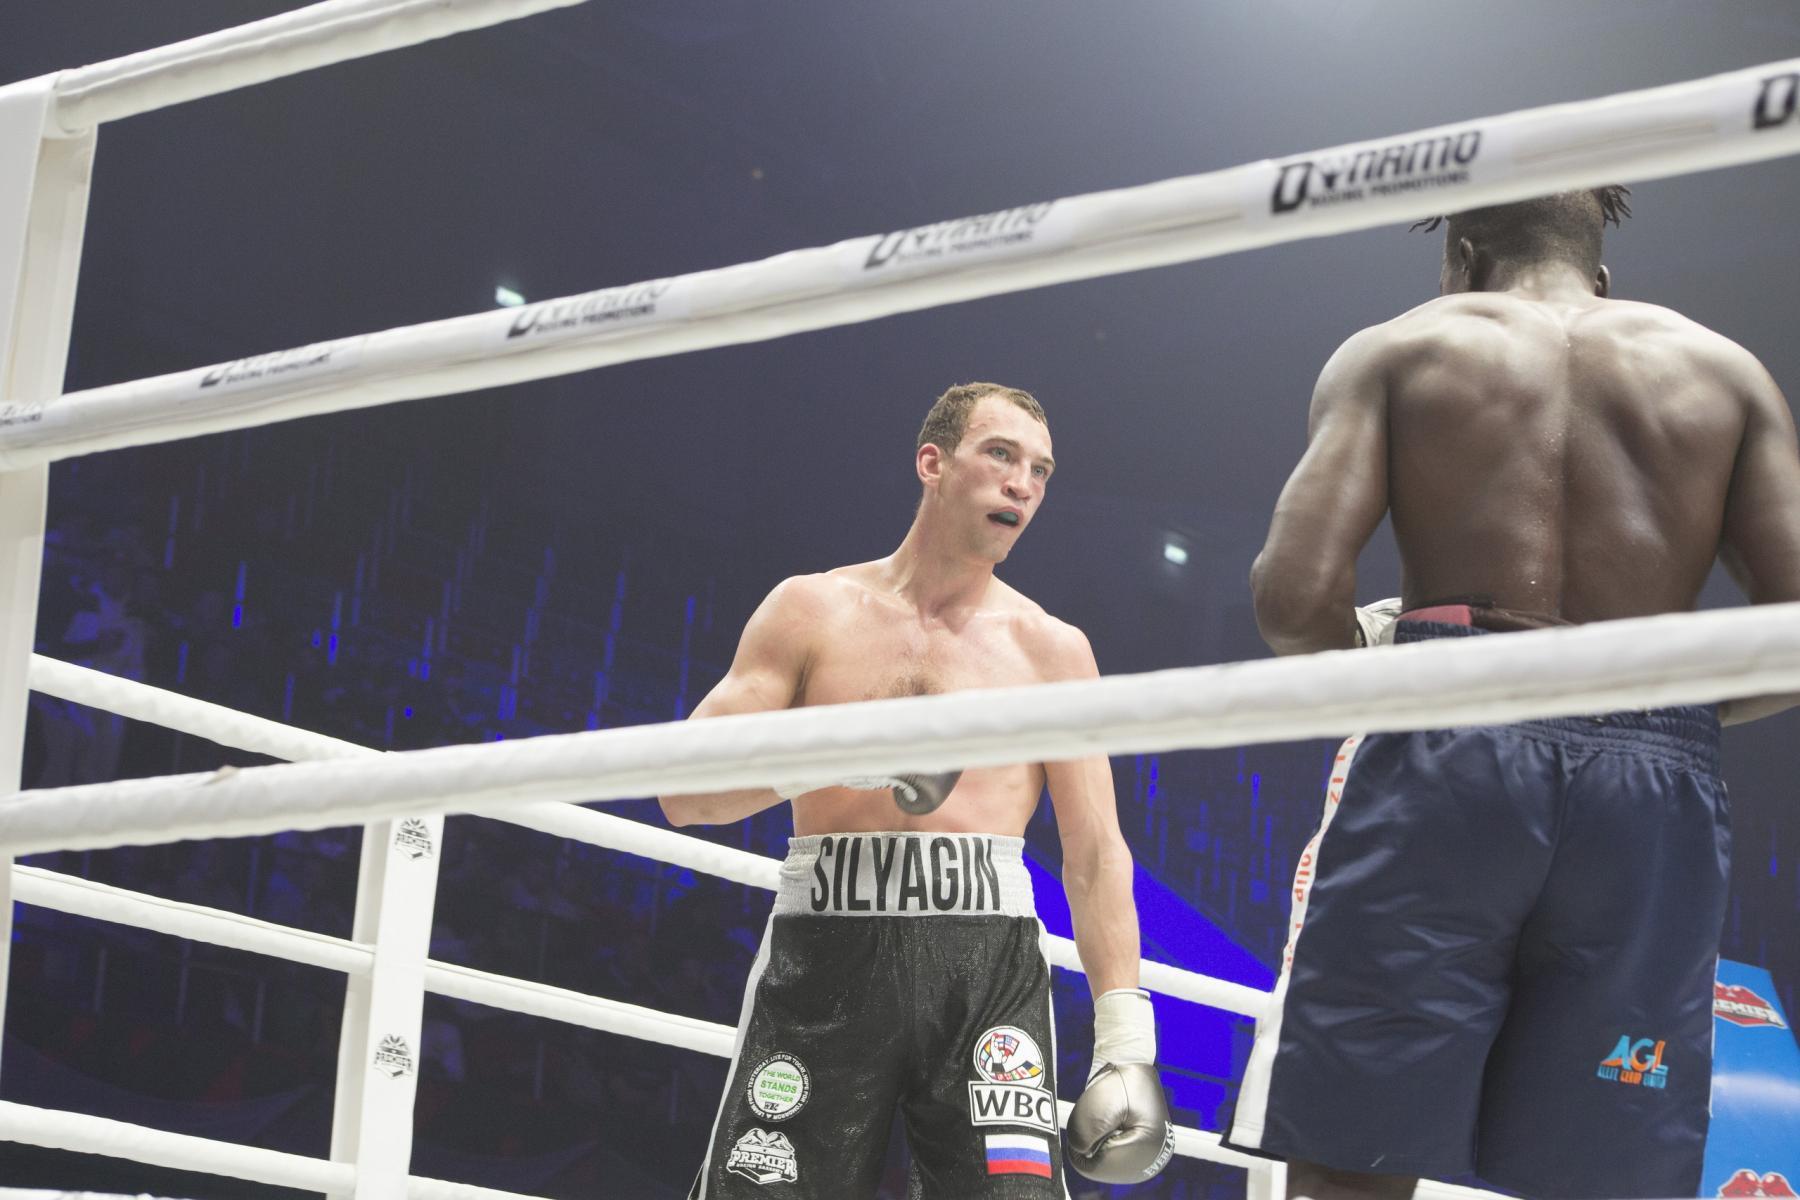 фото Боксёр из Новосибирска Павел Силягин стал азиатско-тихоокеанским чемпионом WBO 3